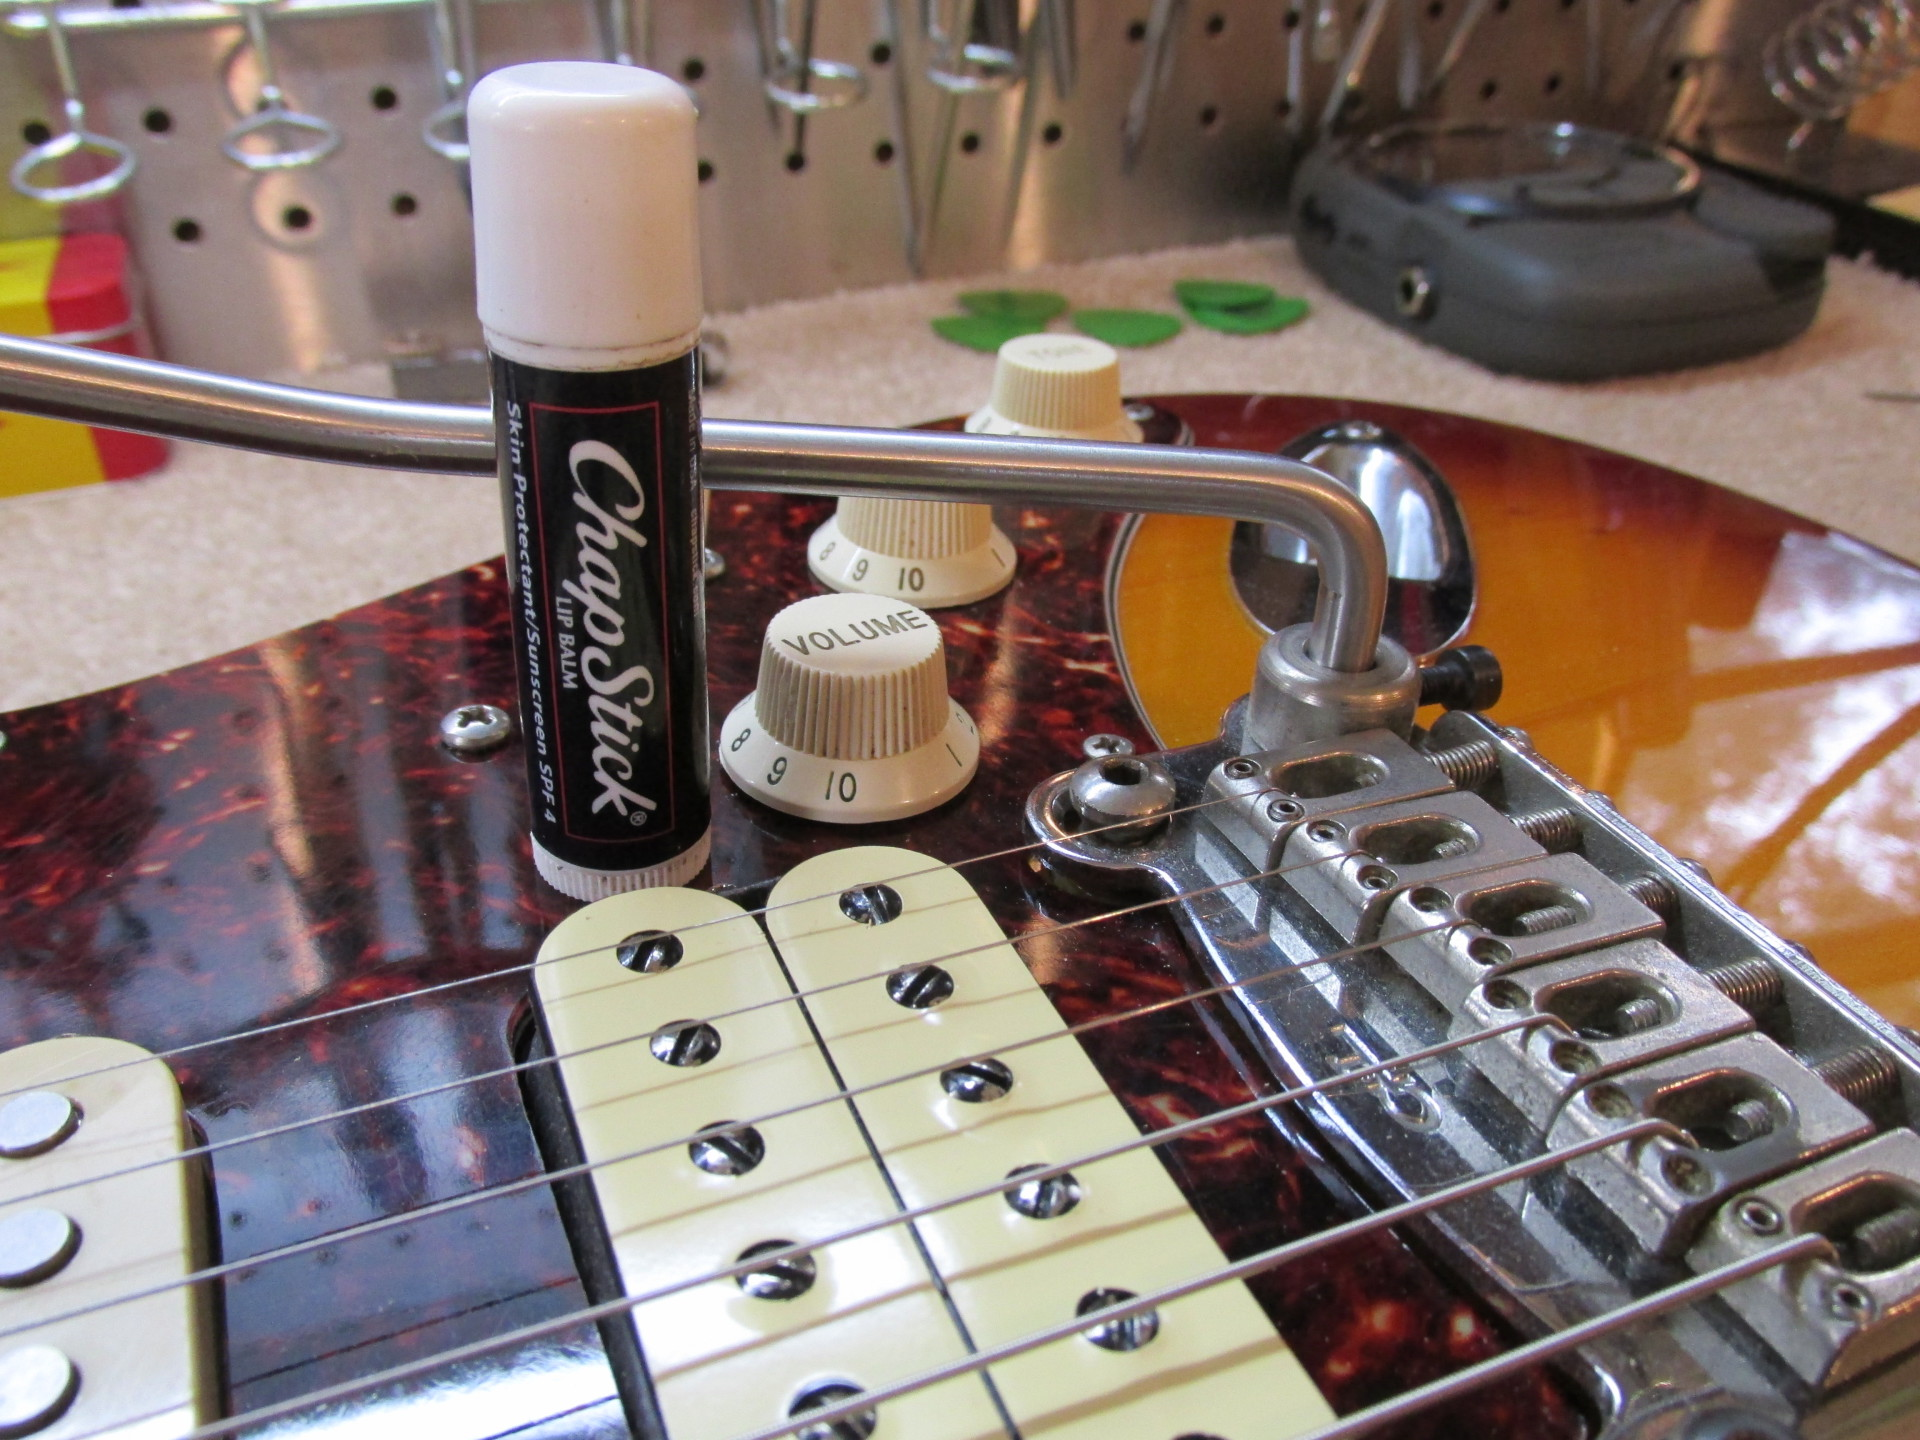 Fact, not friction: Lip balm as a guitar tool